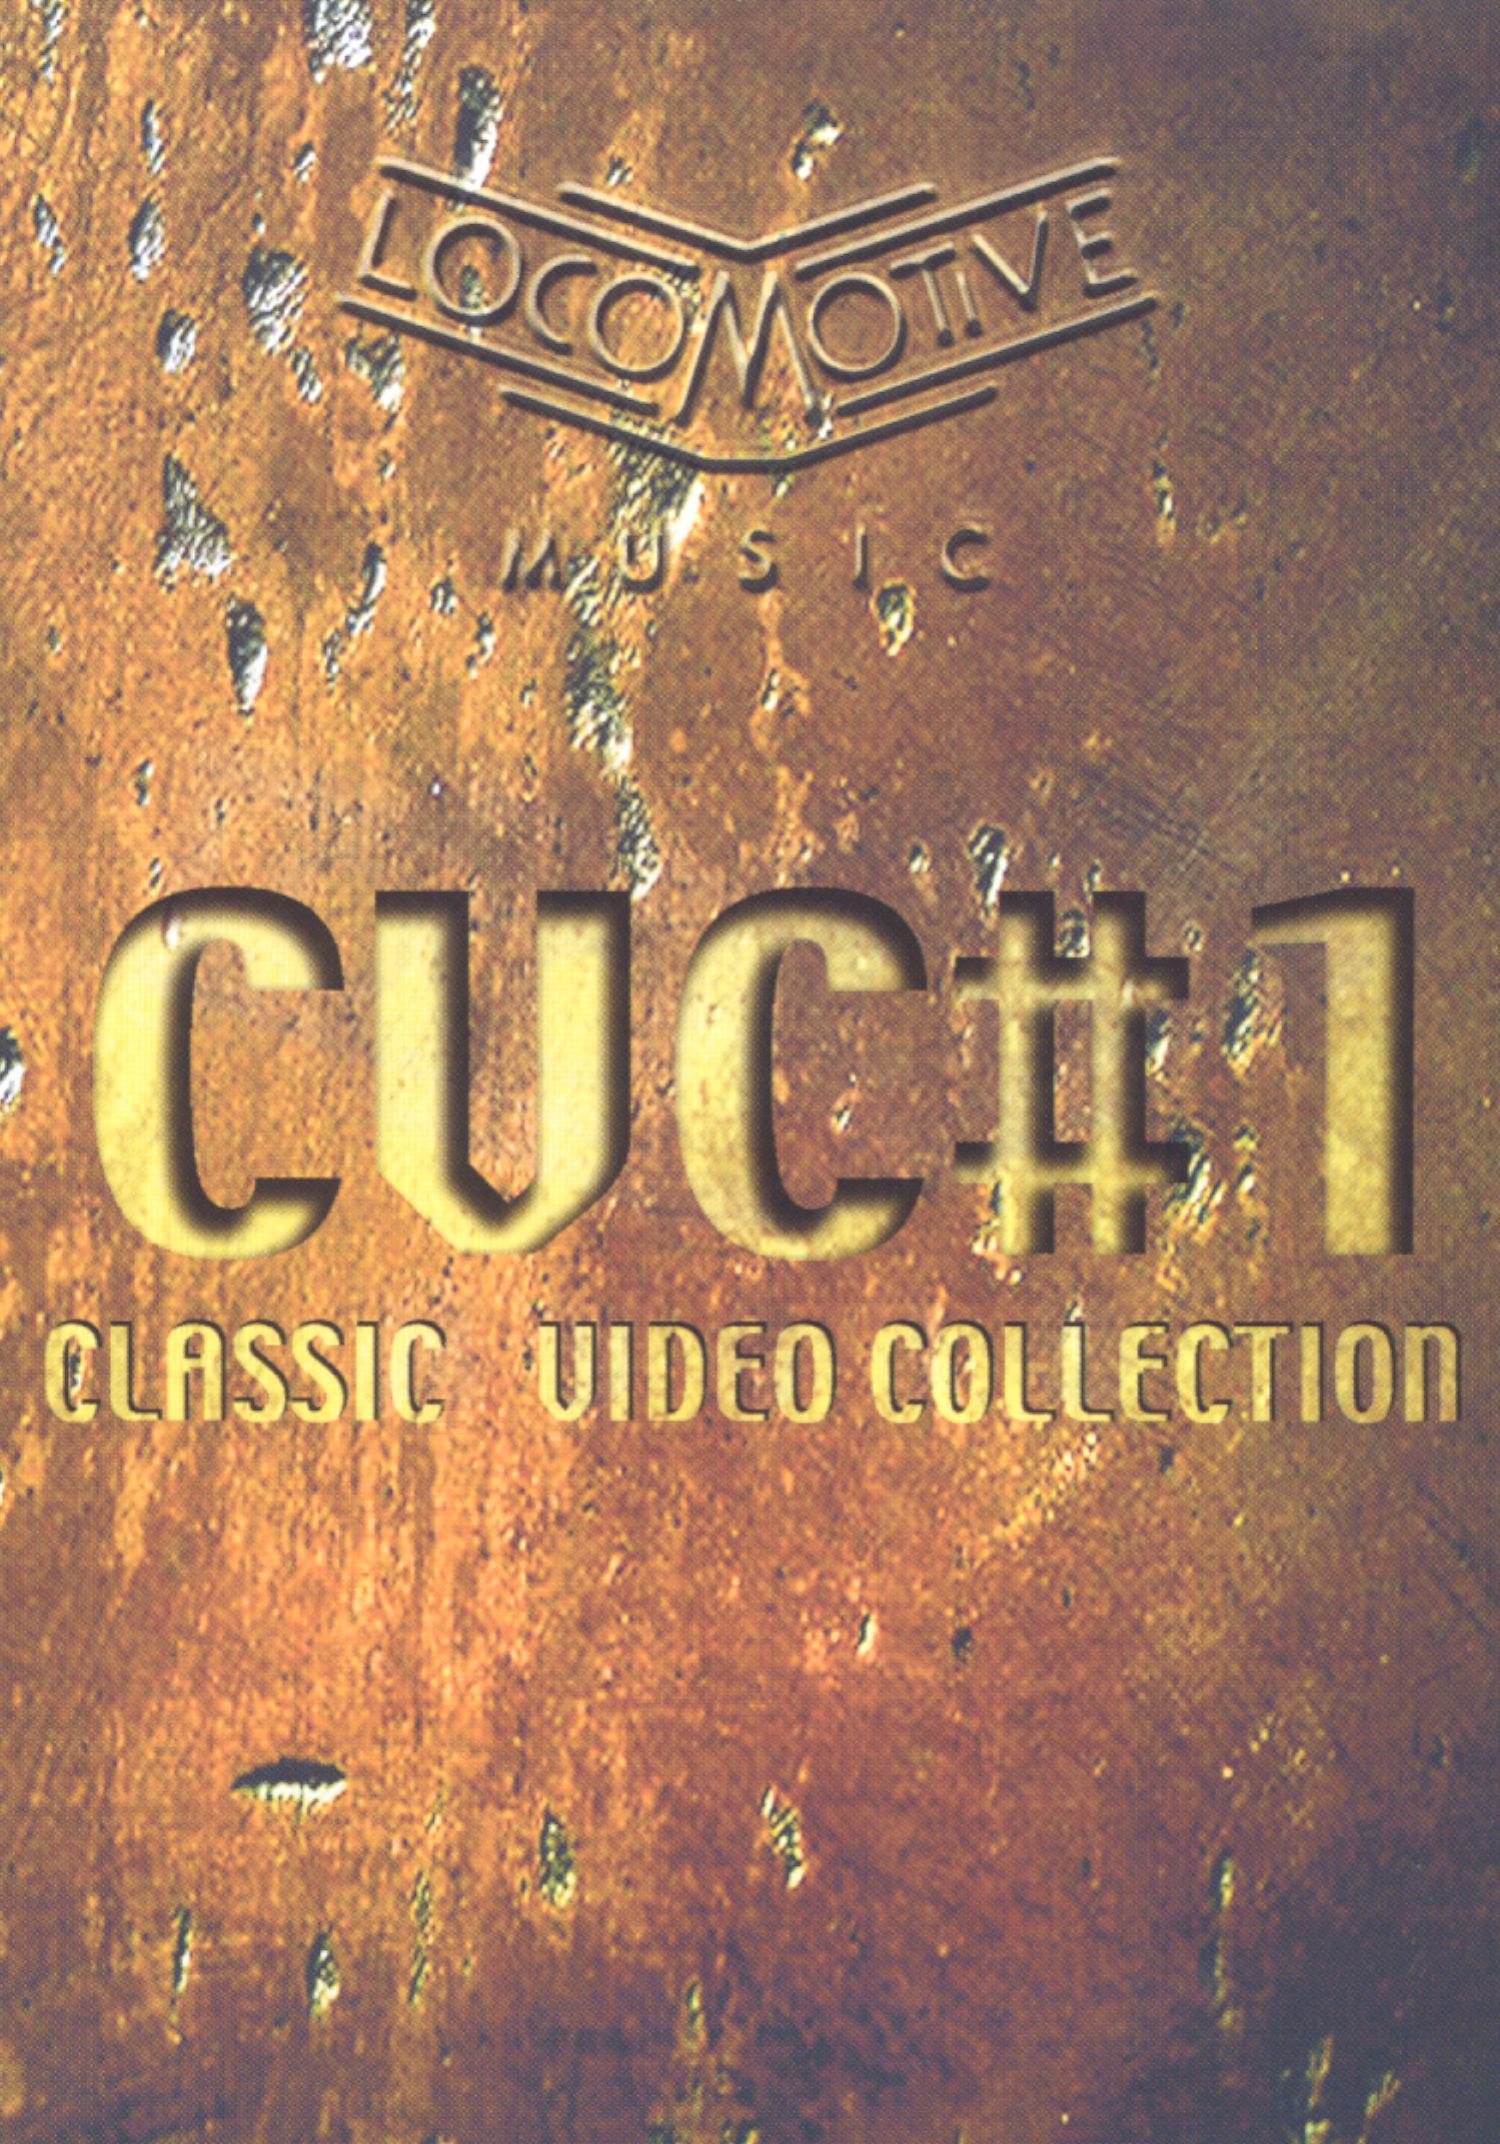 Locomotive Music: Classic Video Collection, Vol. 1